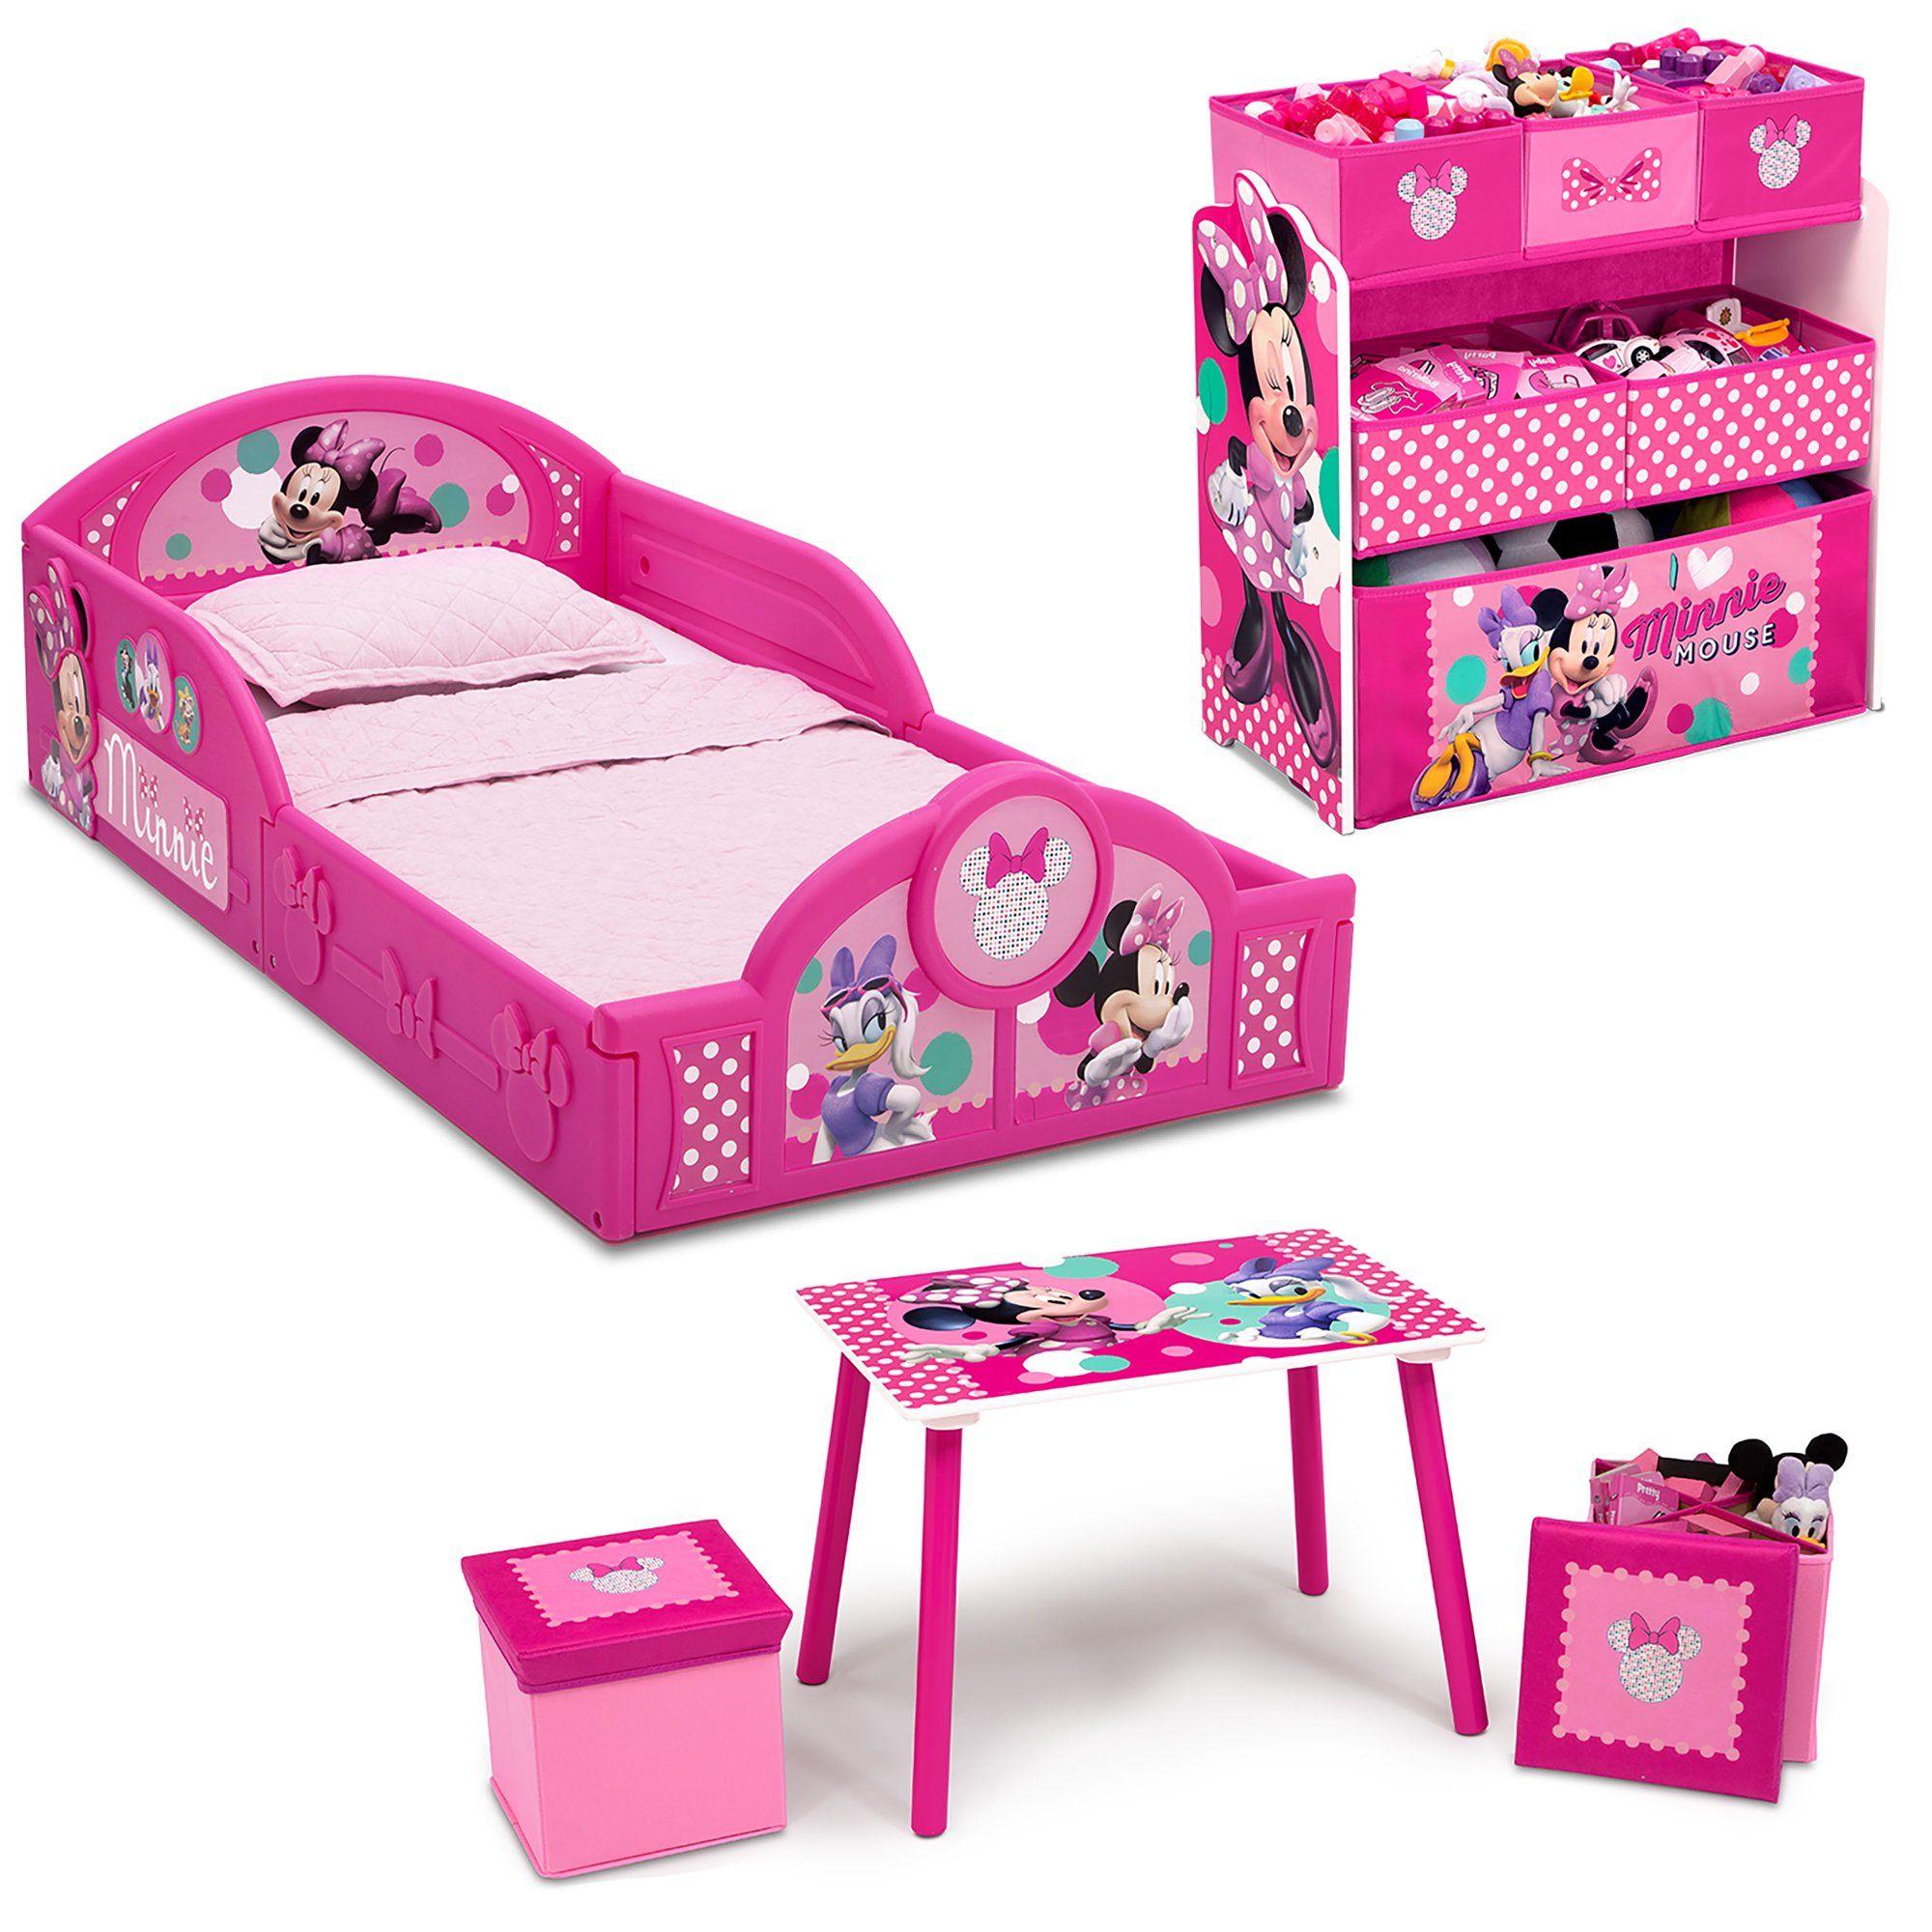 Disney Minnie Mouse 5 Piece Toddler Bedroom Set By Delta Children Includes Toddler Bed Table 2 Ottoman Set Multi Bin Toy Organizer Walmart Com Toddler Bedroom Sets Minnie Mouse Bedroom Toddler Bedrooms